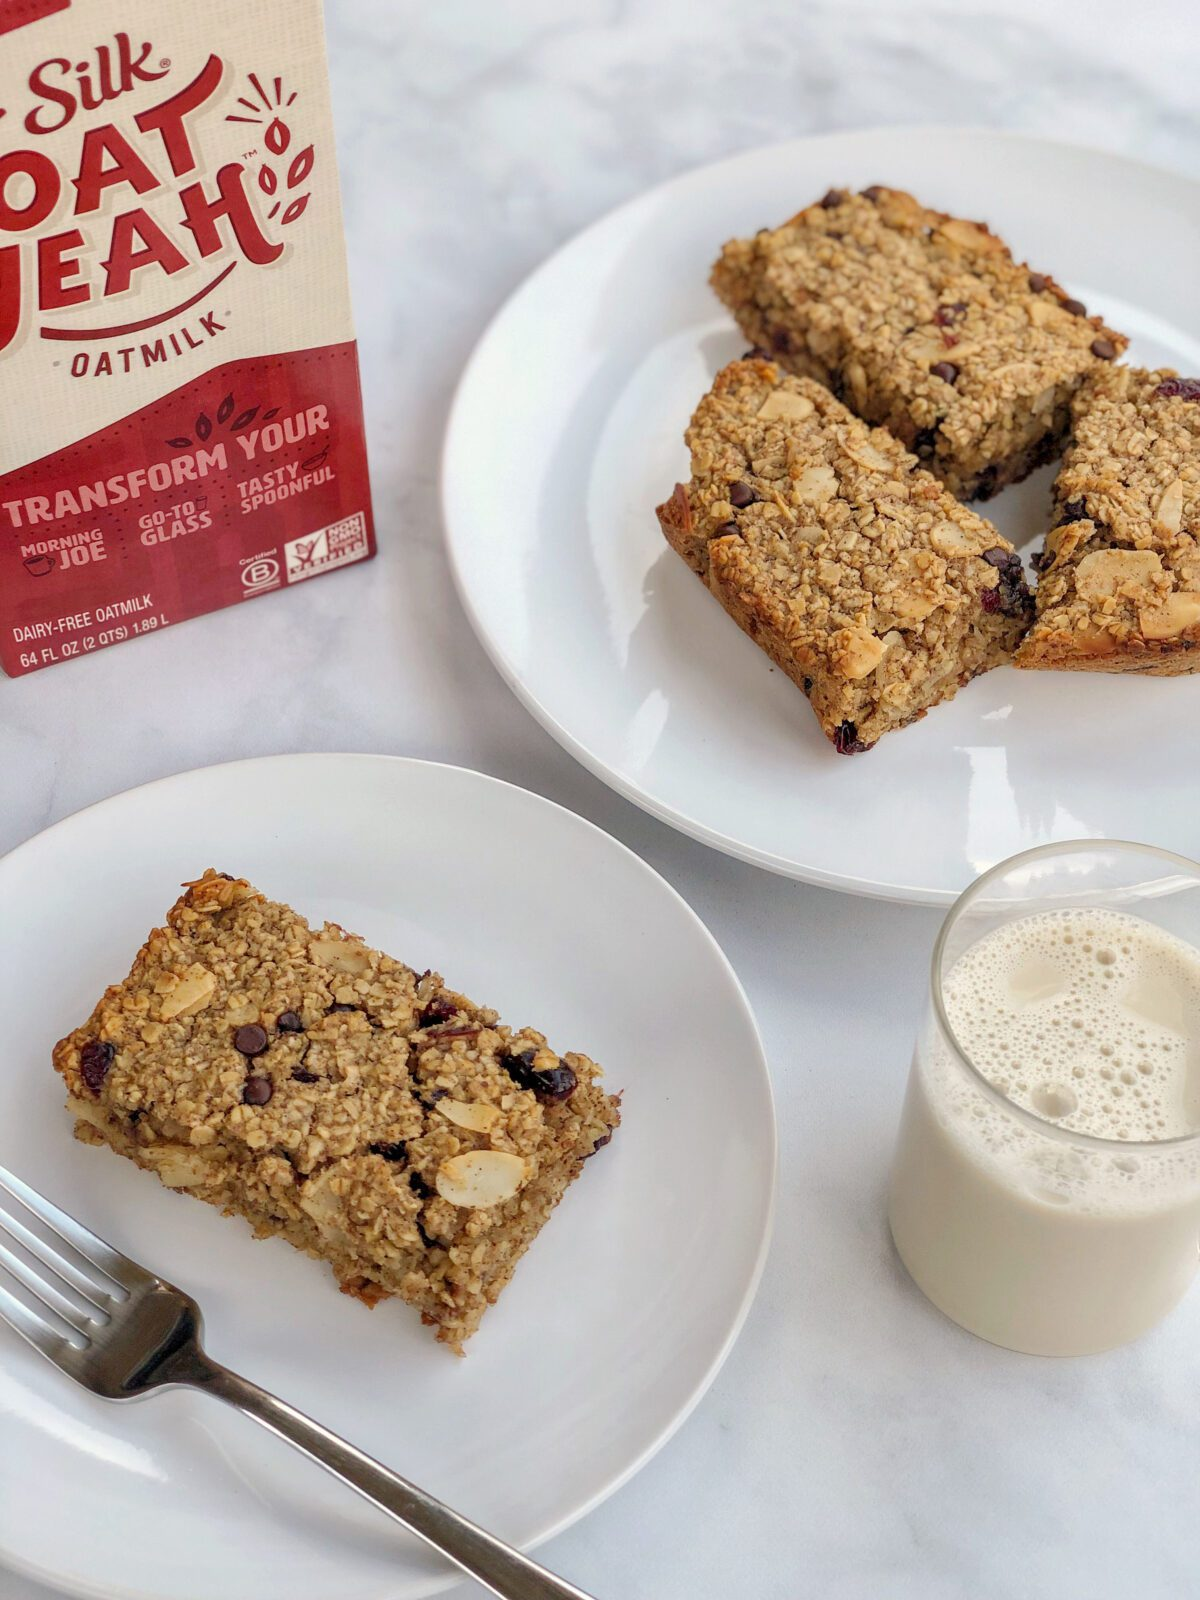 Silk-OatMilk-Baked-Dairy-Free-Oatmeal-Bars-Recipe